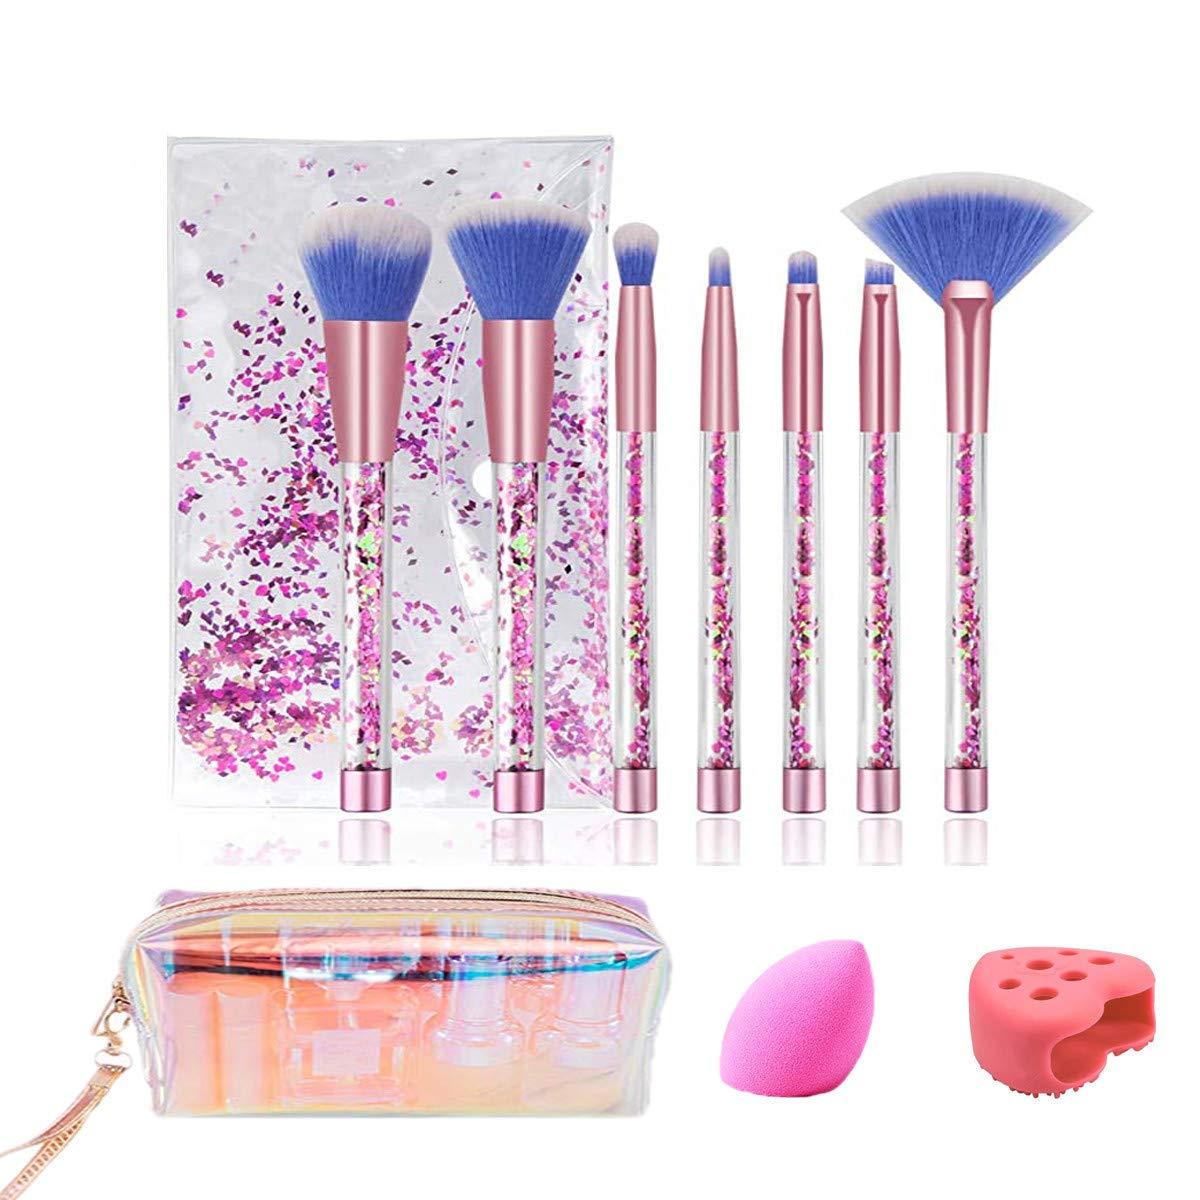 Glitter Quicksand Makeup Brush Set,7 Makeup Brushes for Foundation Powder Blush Eyeshadow & 1 Blender Sponges & 1 Brush Cleaner Mat with drying rack & 1 Cosmetic bag